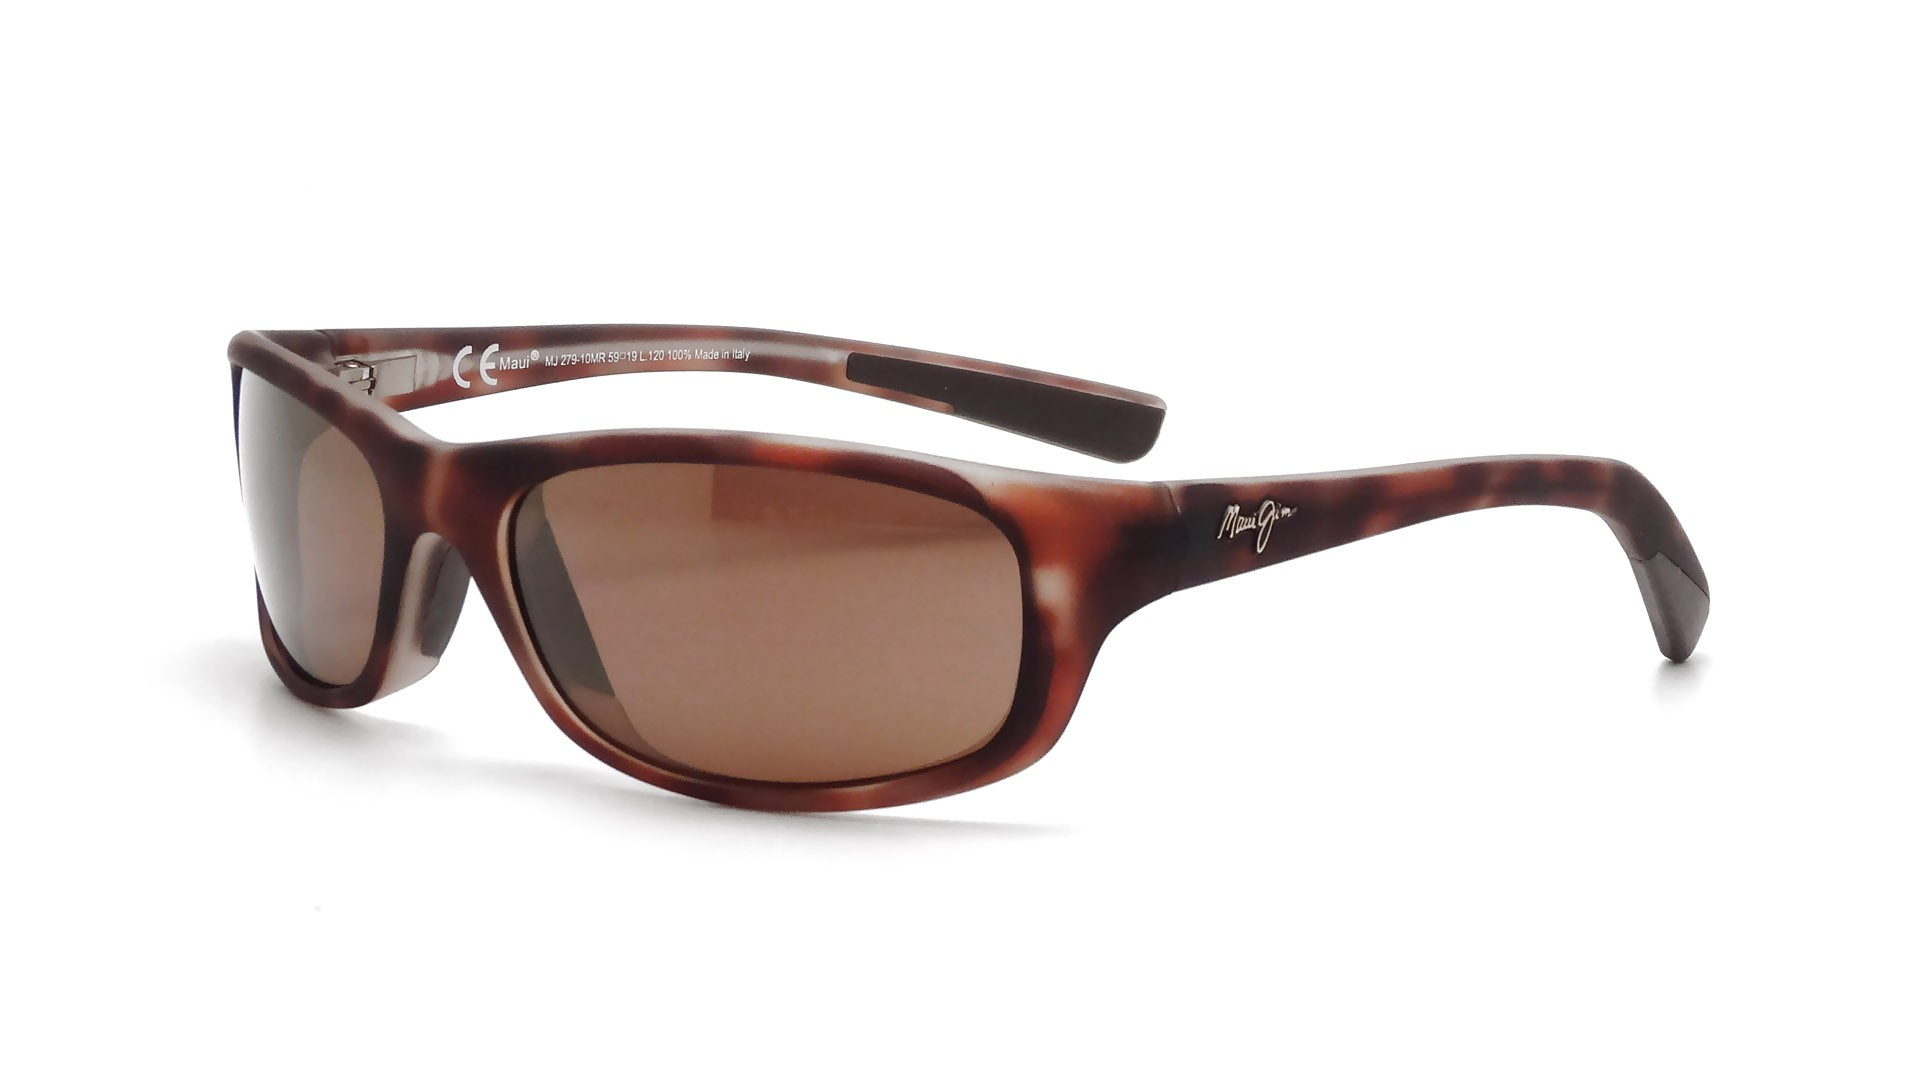 37055ef27d Sunglasses Maui Jim Kipahulu Tortoise H279-10MR 59-19 Large Polarized